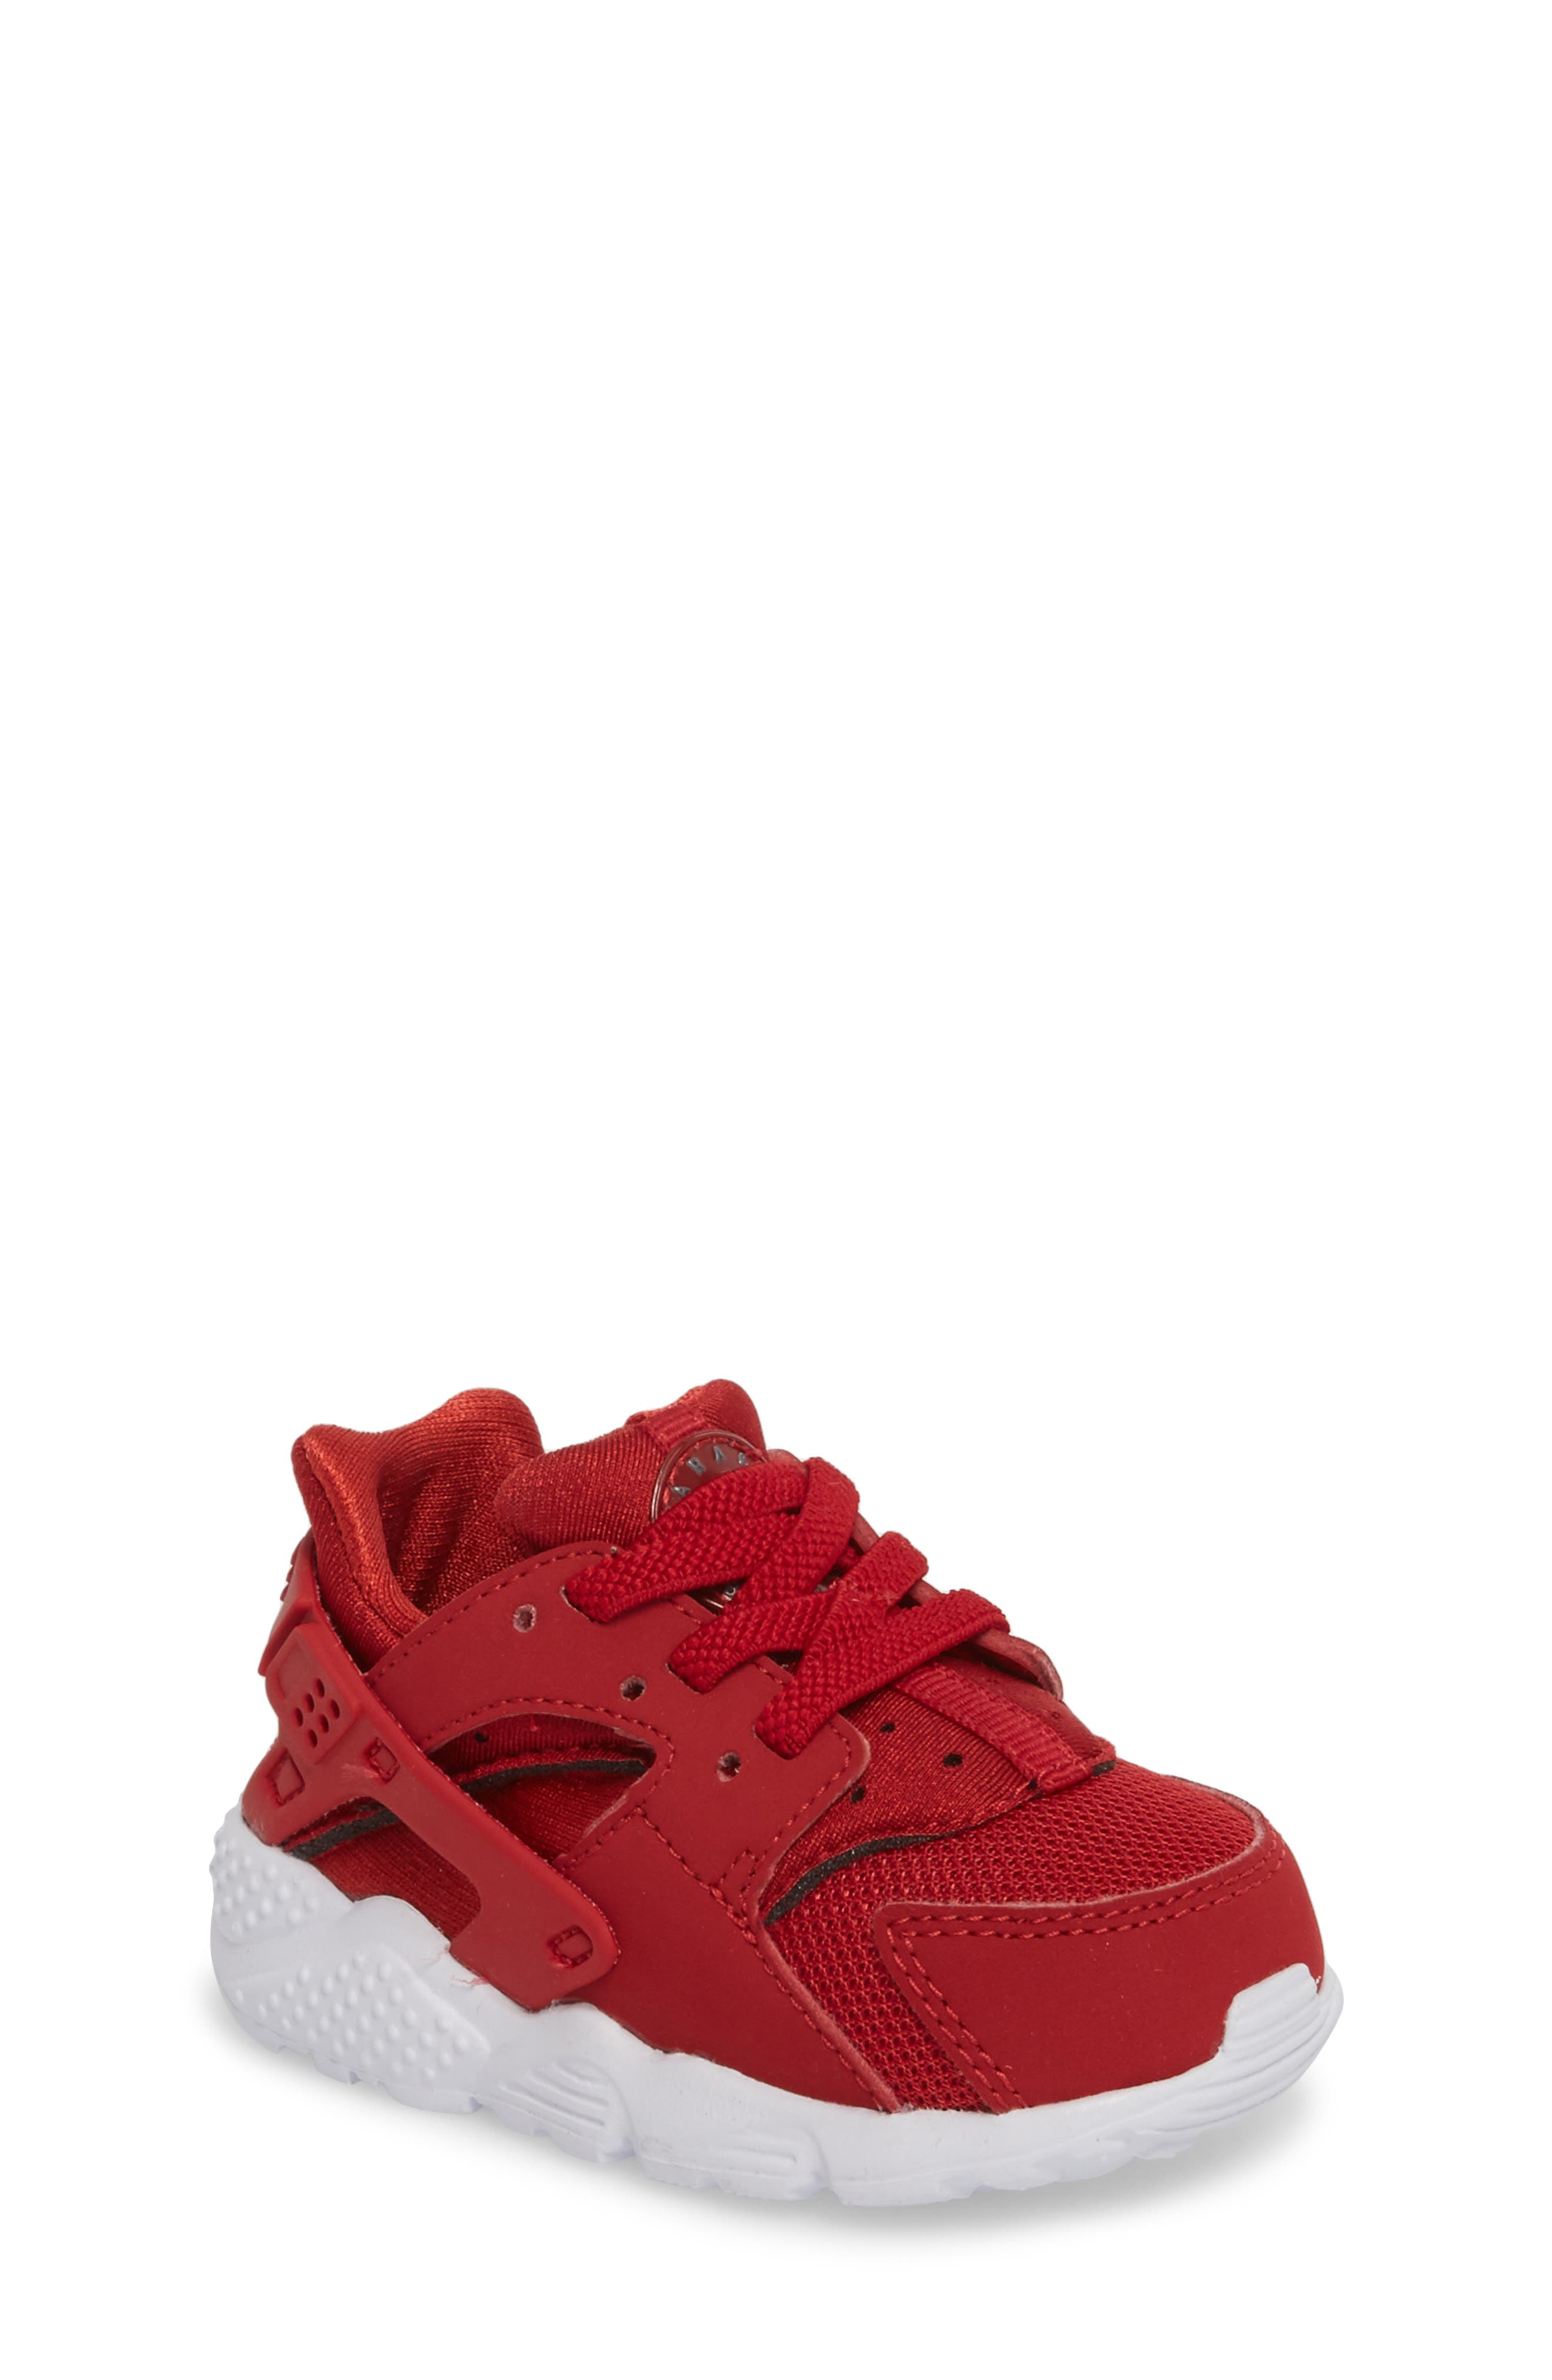 'Huarache Run' Sneaker,                         Main,                         color, Gym Red/ Dark Grey/ White